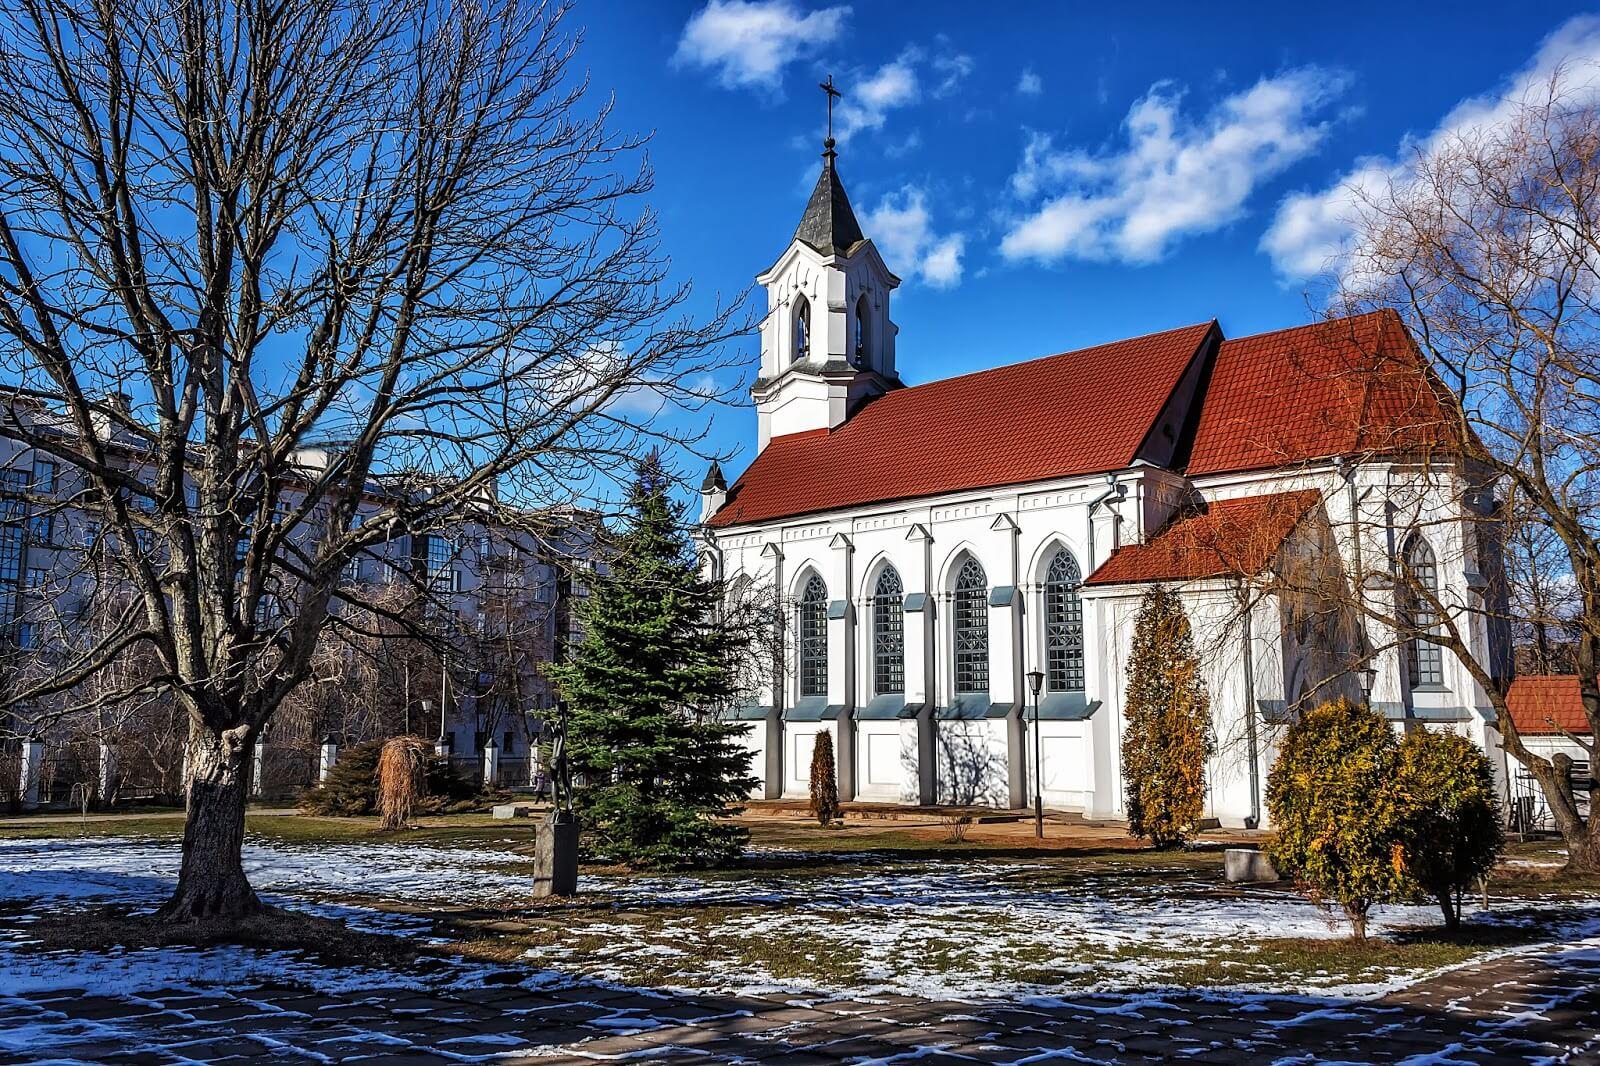 Костел Святого Роха - История костела святого Роха в Минске на проспекте Независимости